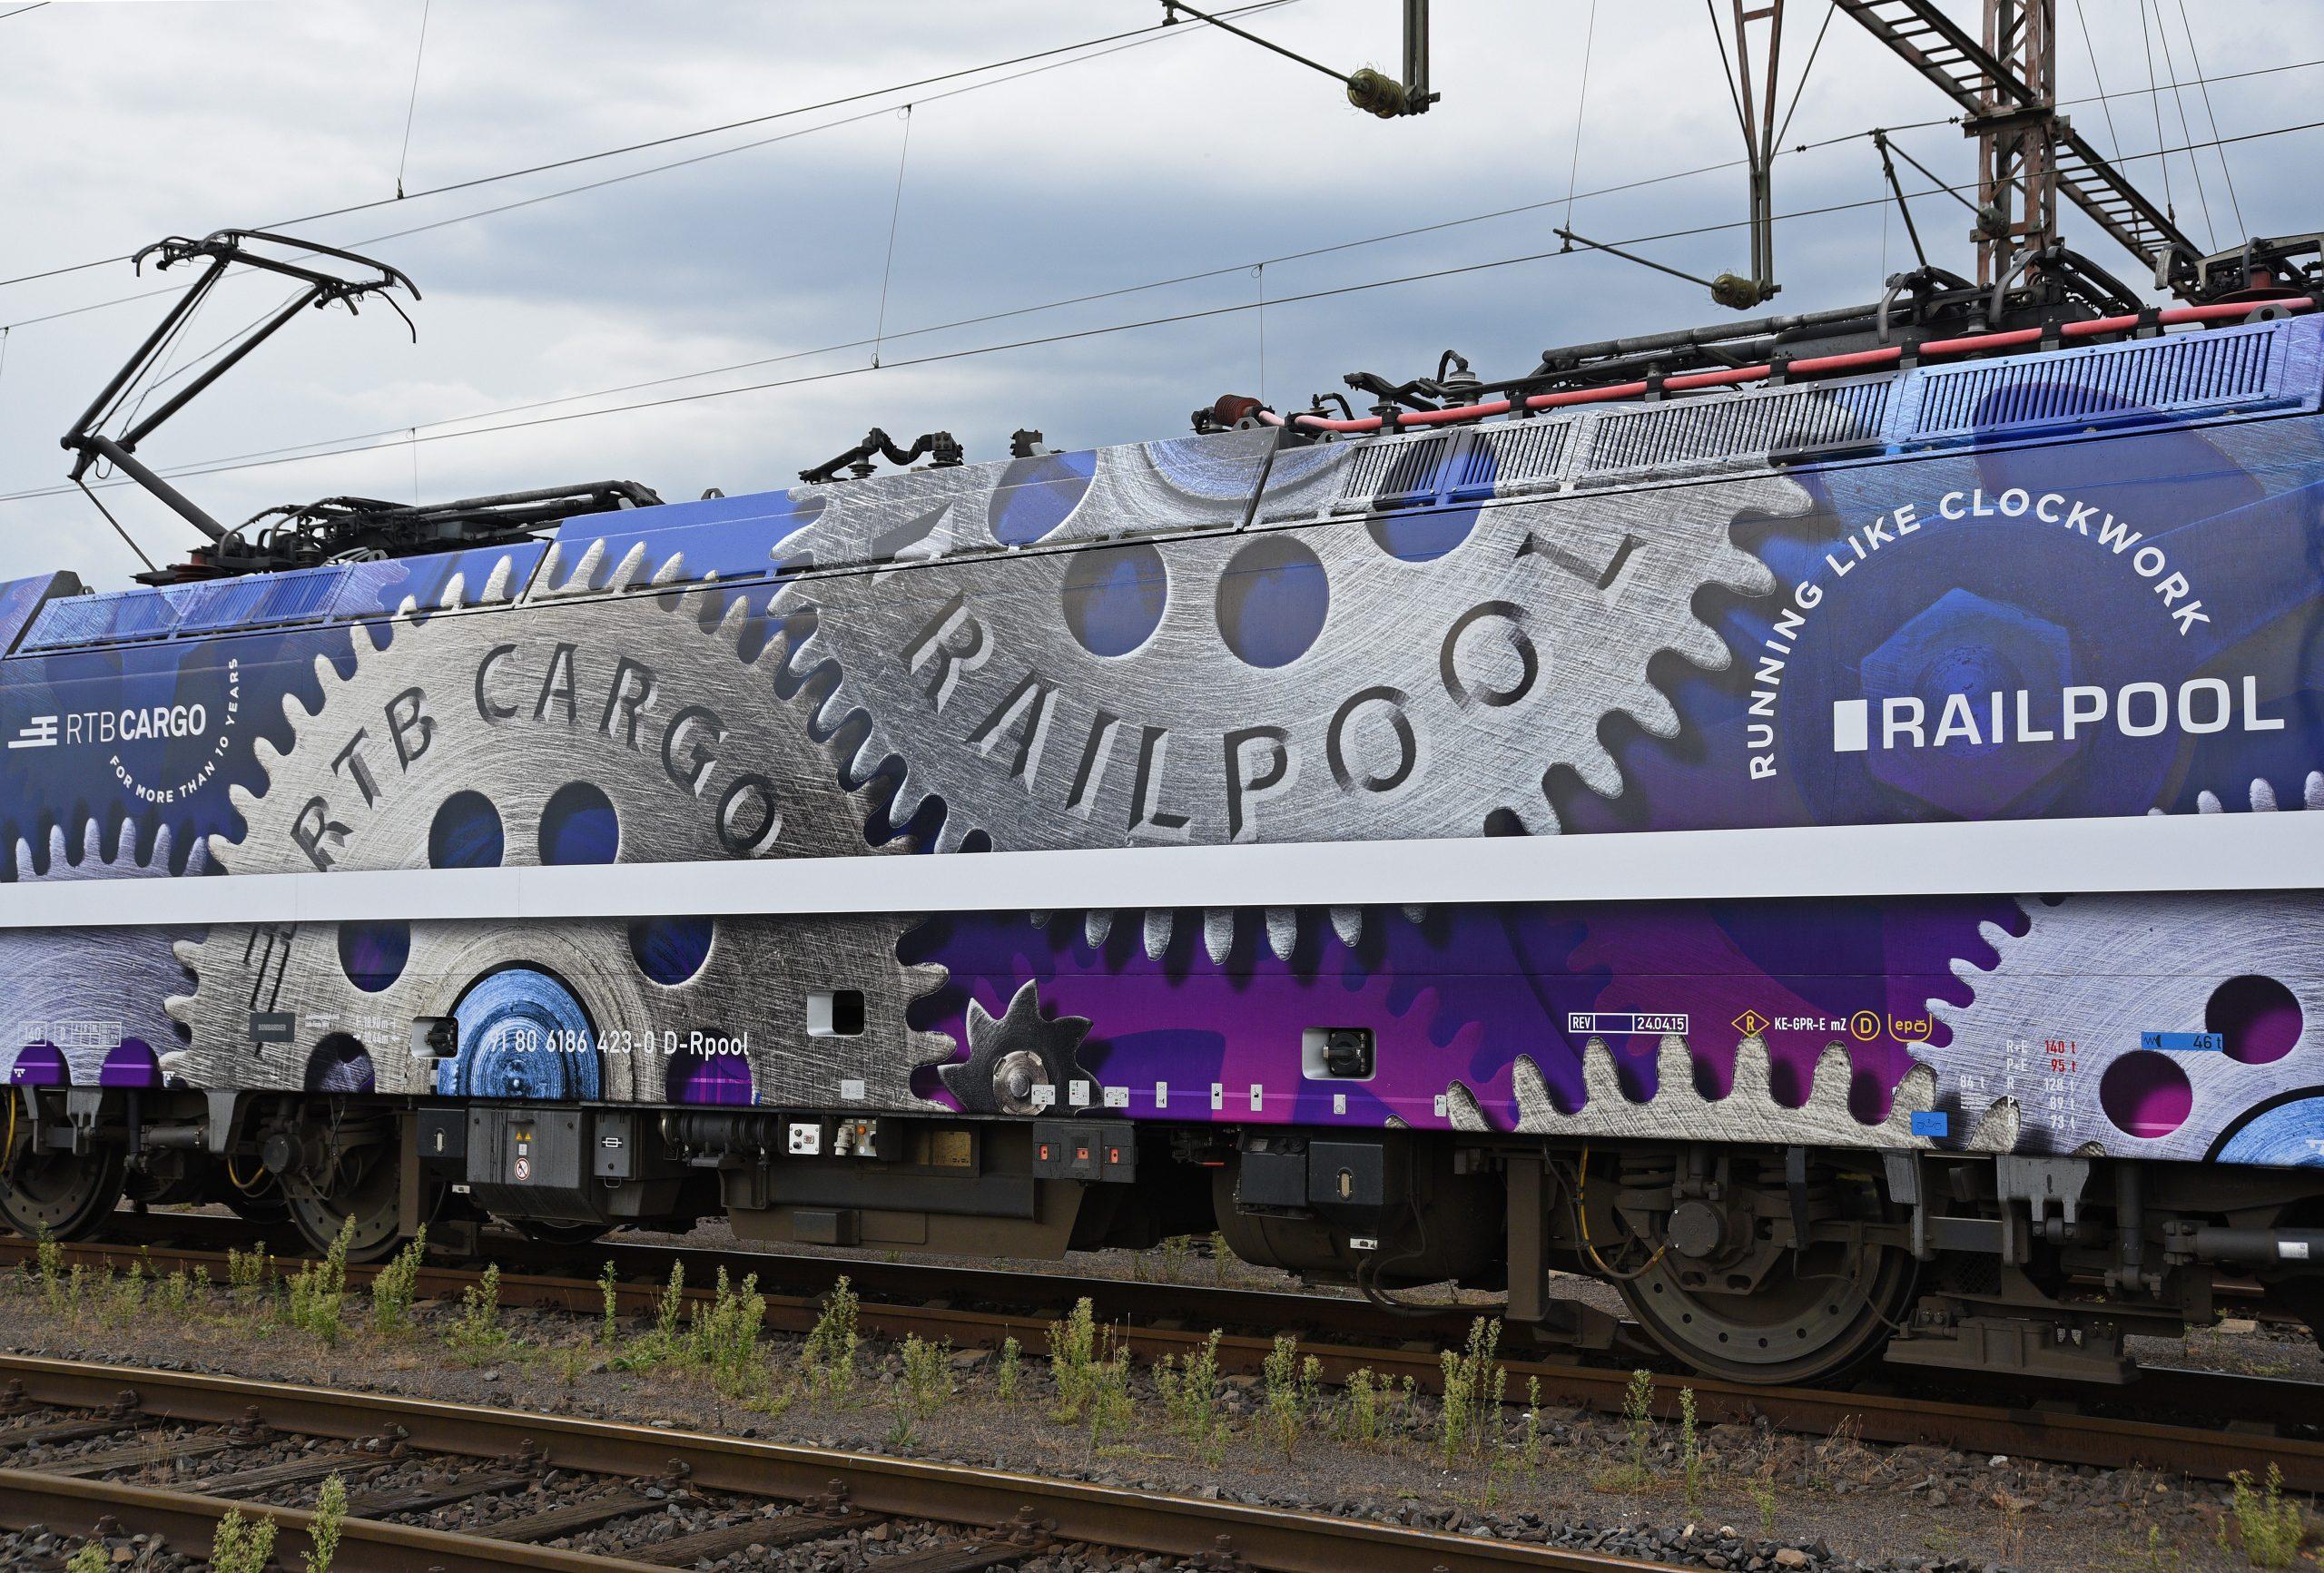 Railpool RTB Running like clockwork